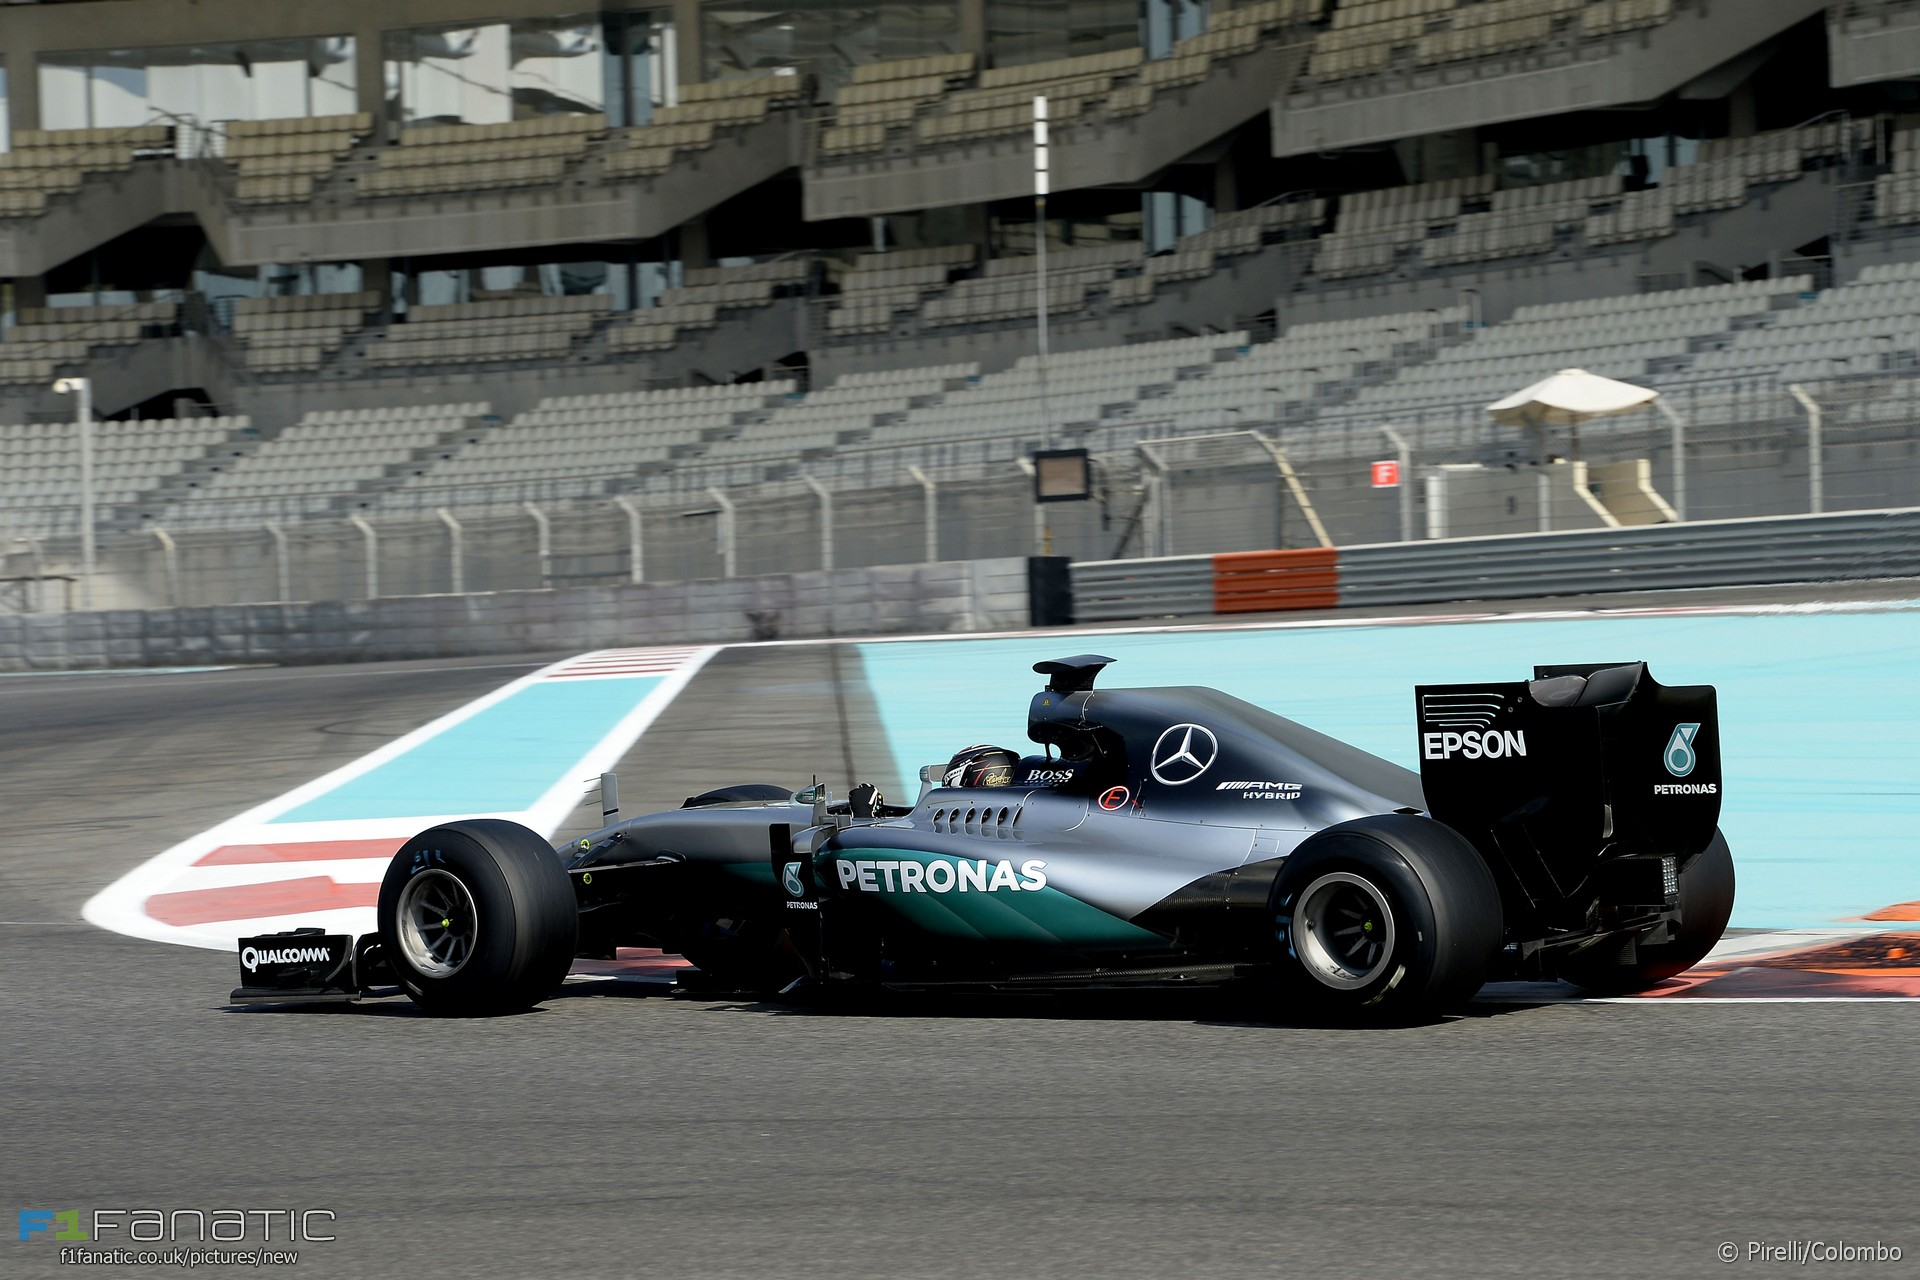 Pascal Wehrlein, Mercedes, Yas Marina, 2016